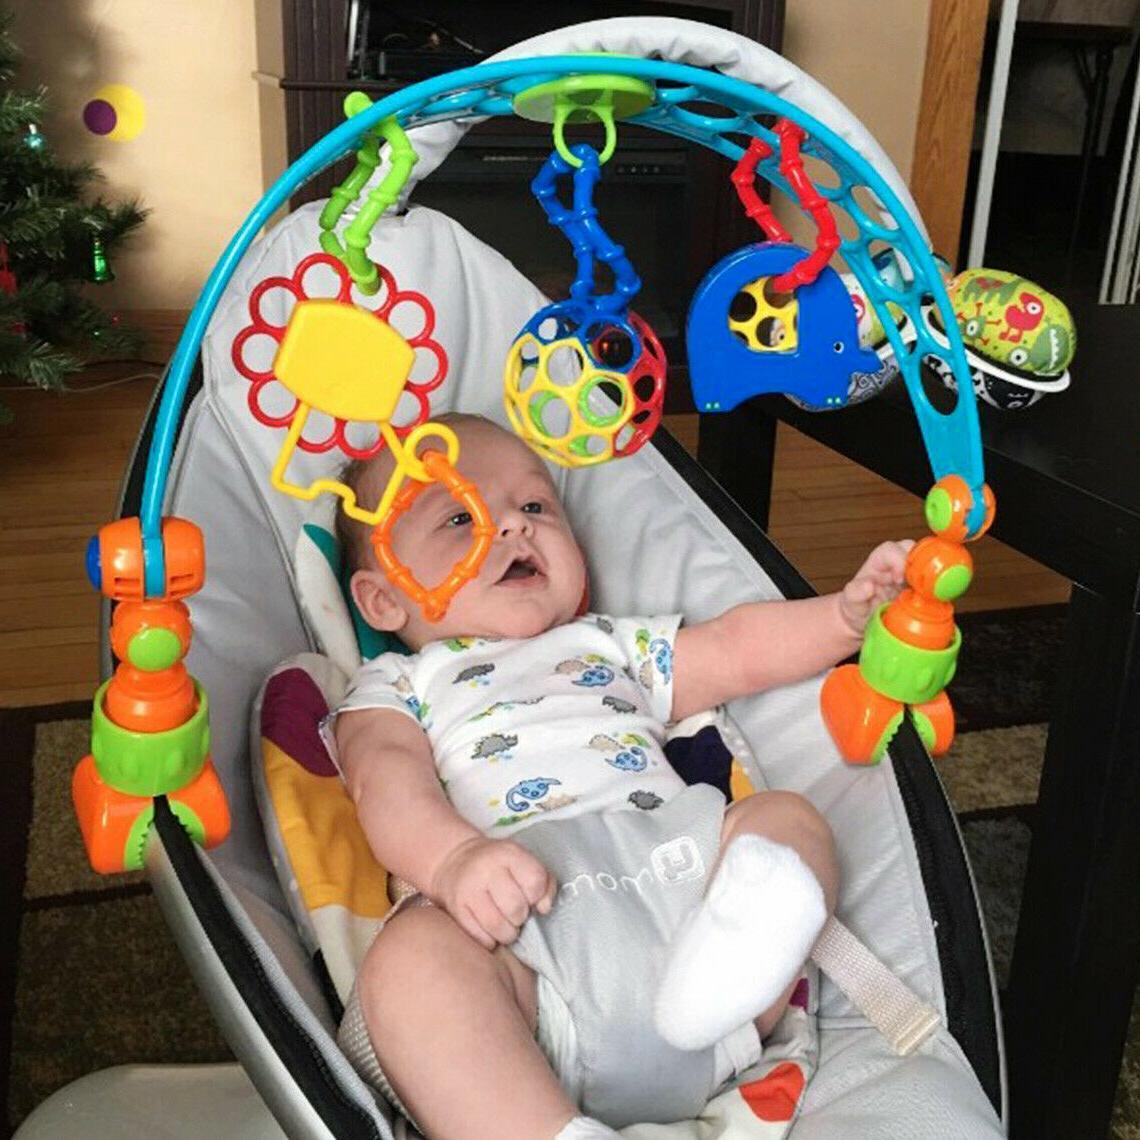 toy arch baby stroller crib activity seat